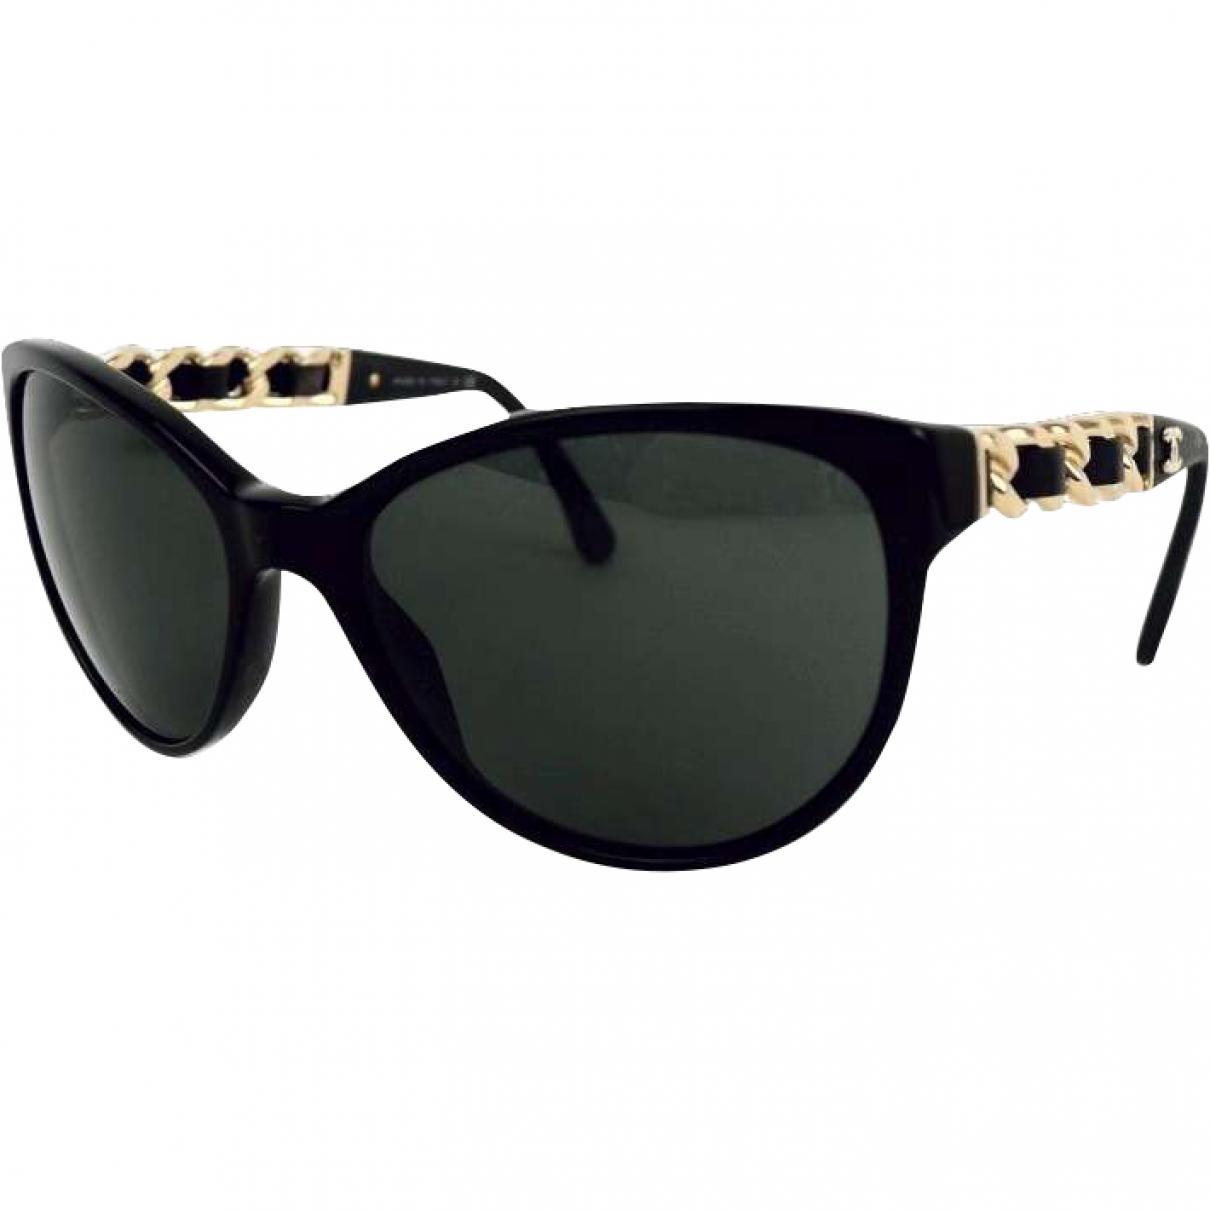 9d64171e4bd31 Chanel Oversized Sunglasses